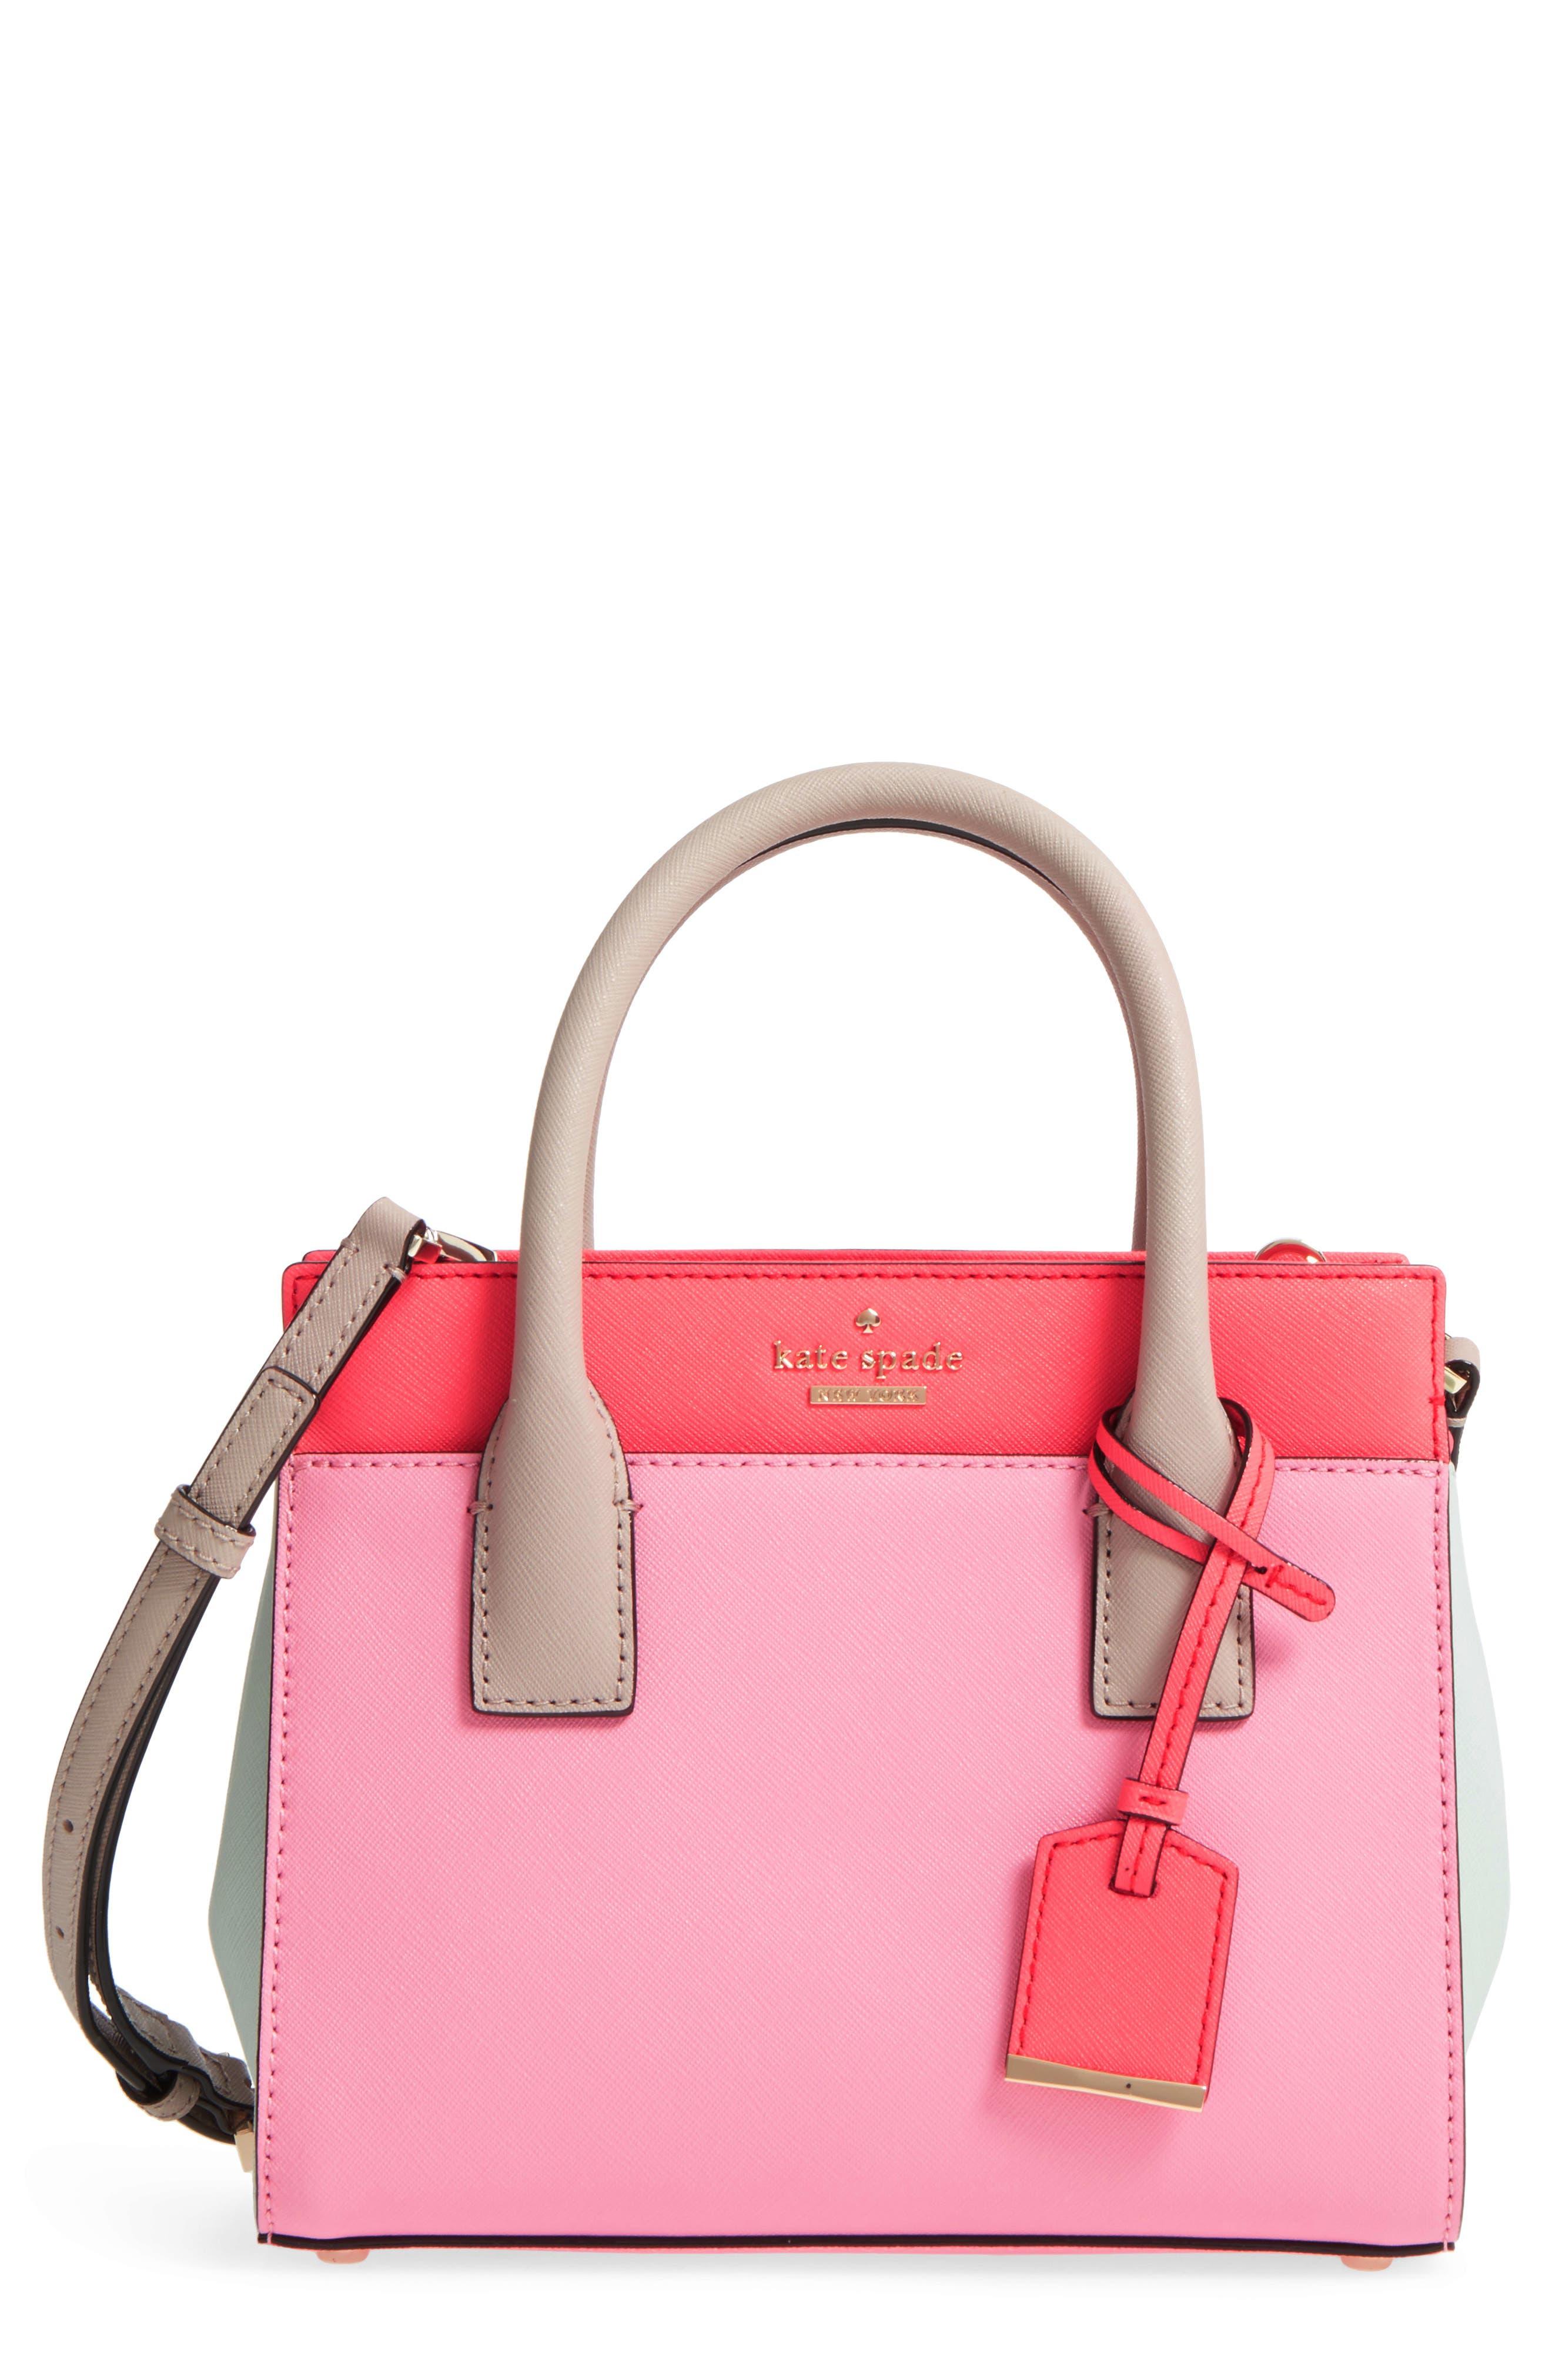 KATE SPADE NEW YORK,                             'cameron street - mini candace' leather satchel,                             Main thumbnail 1, color,                             690